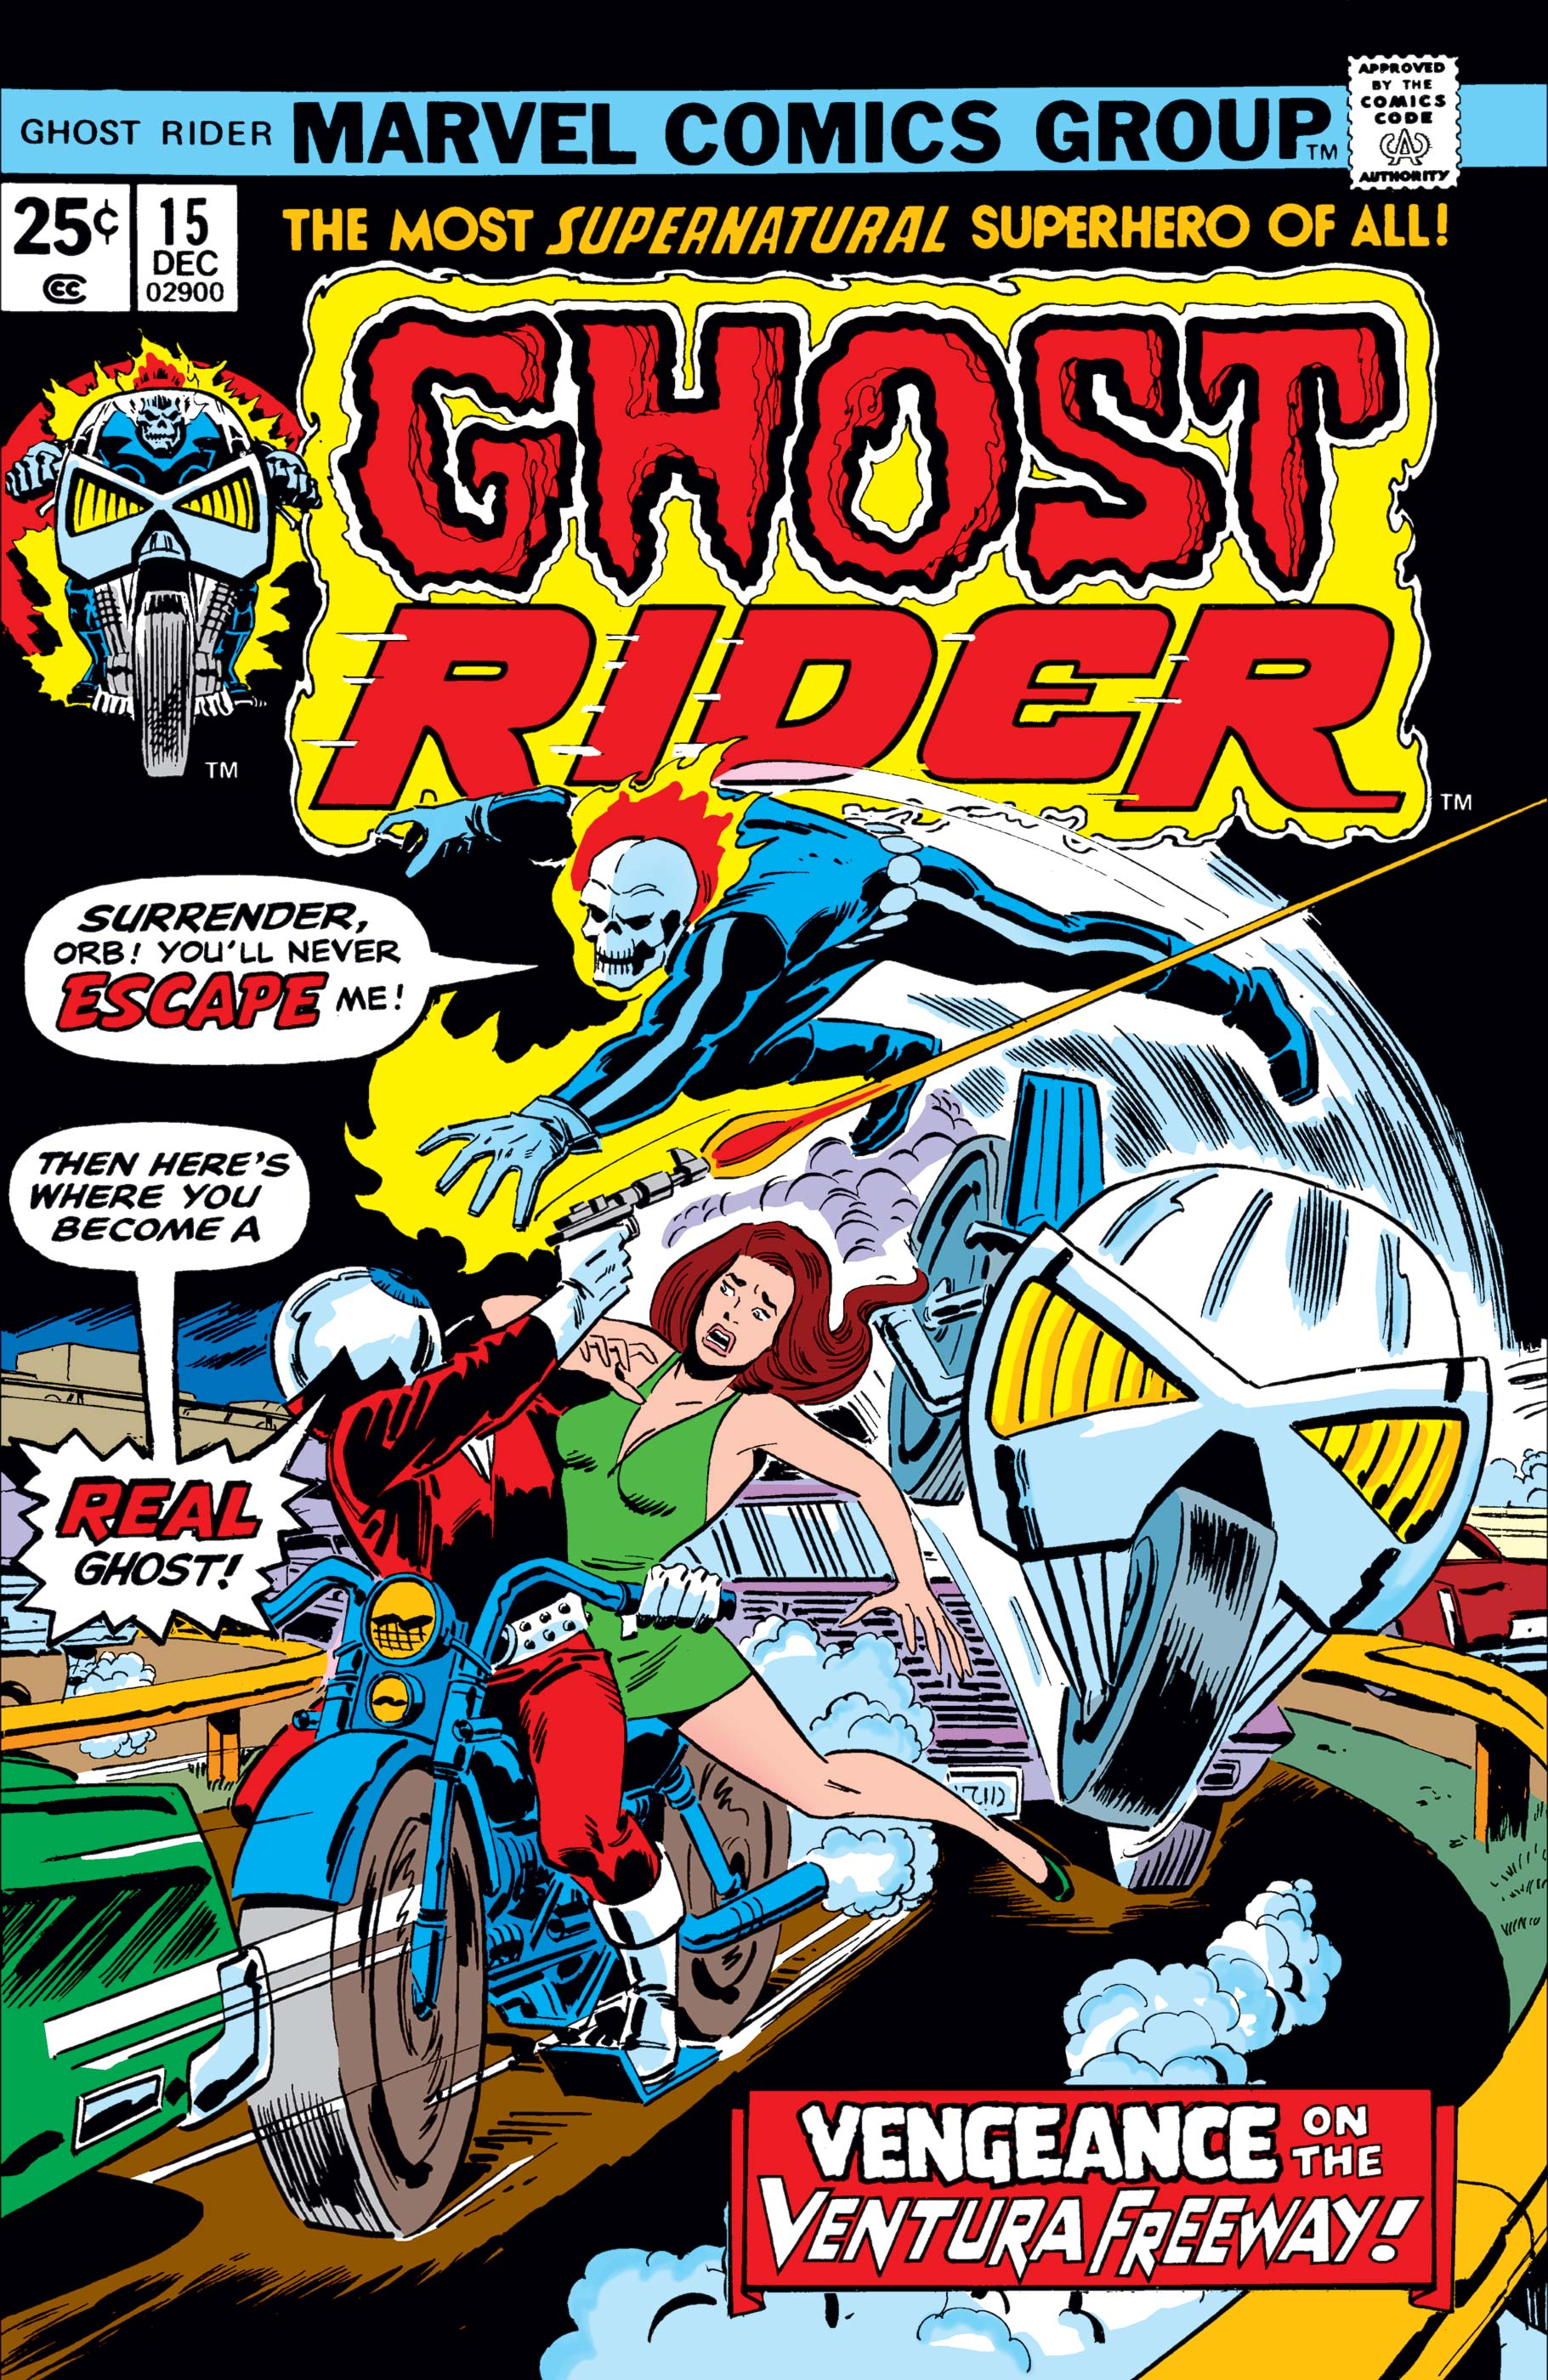 Ghost Rider (1973) #15